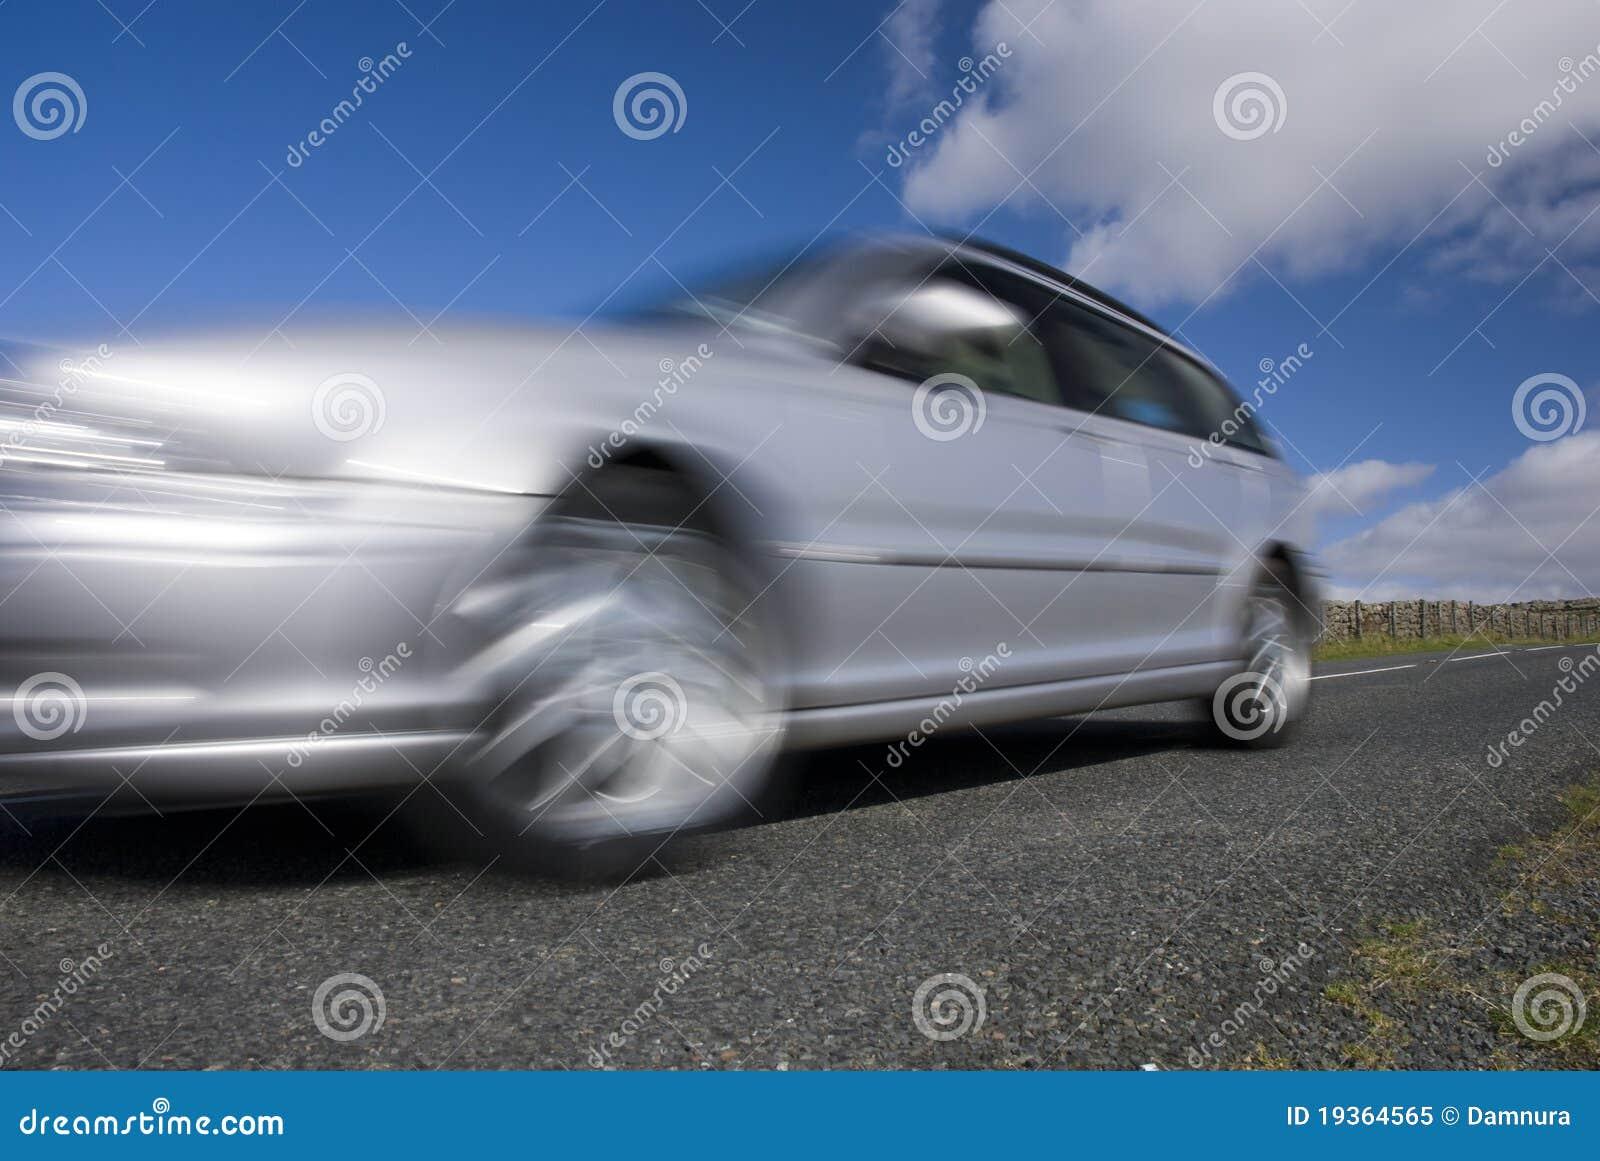 Carro de pressa de prata